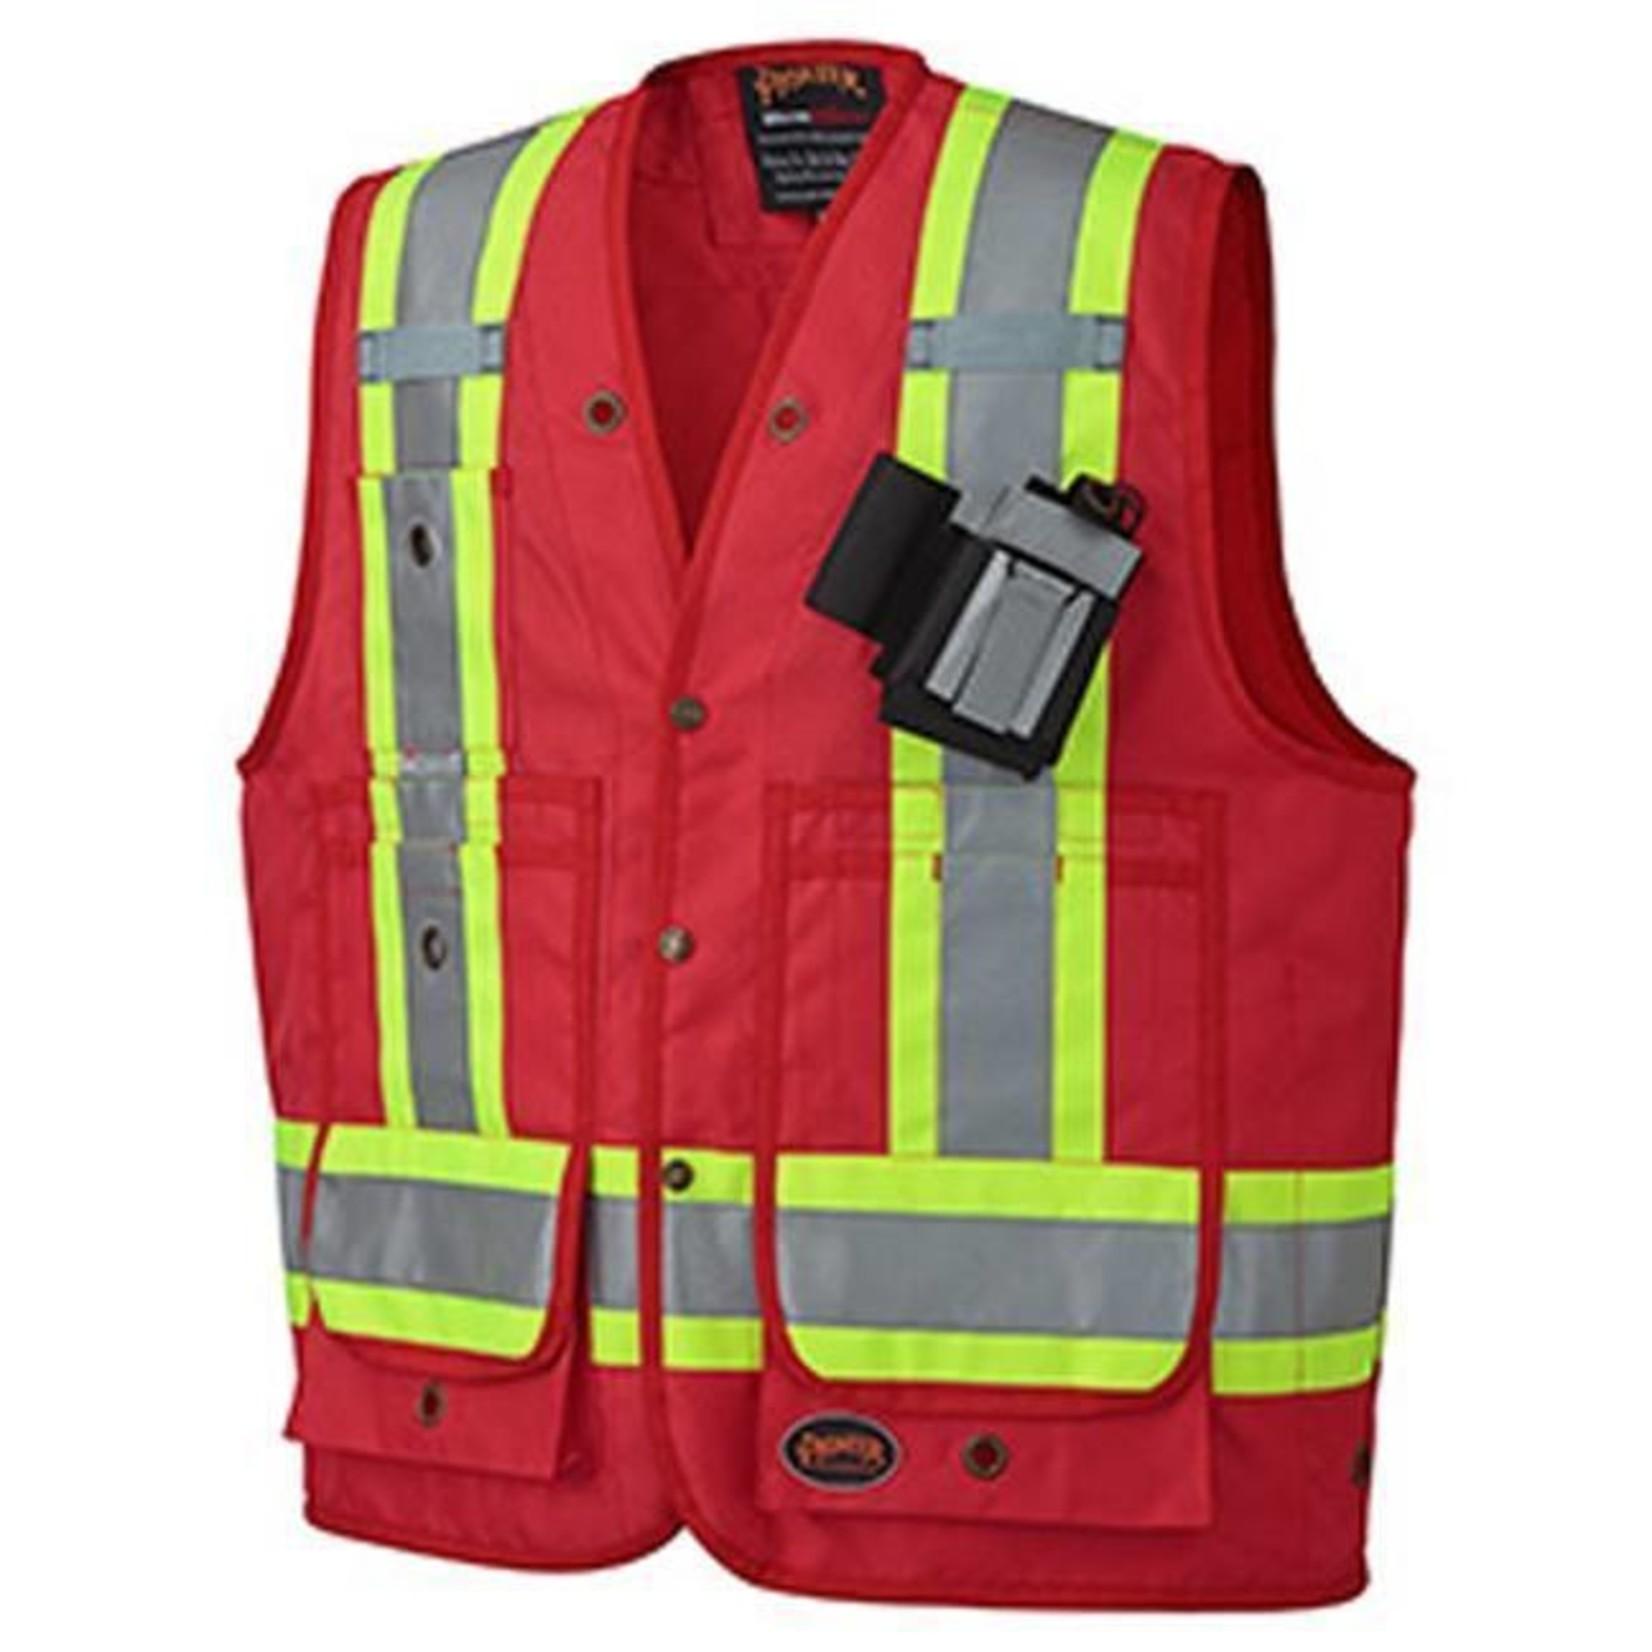 Pioneer Pioneer 693 V1010510 CSA Surveyor's / Supervisor's Vest – Red